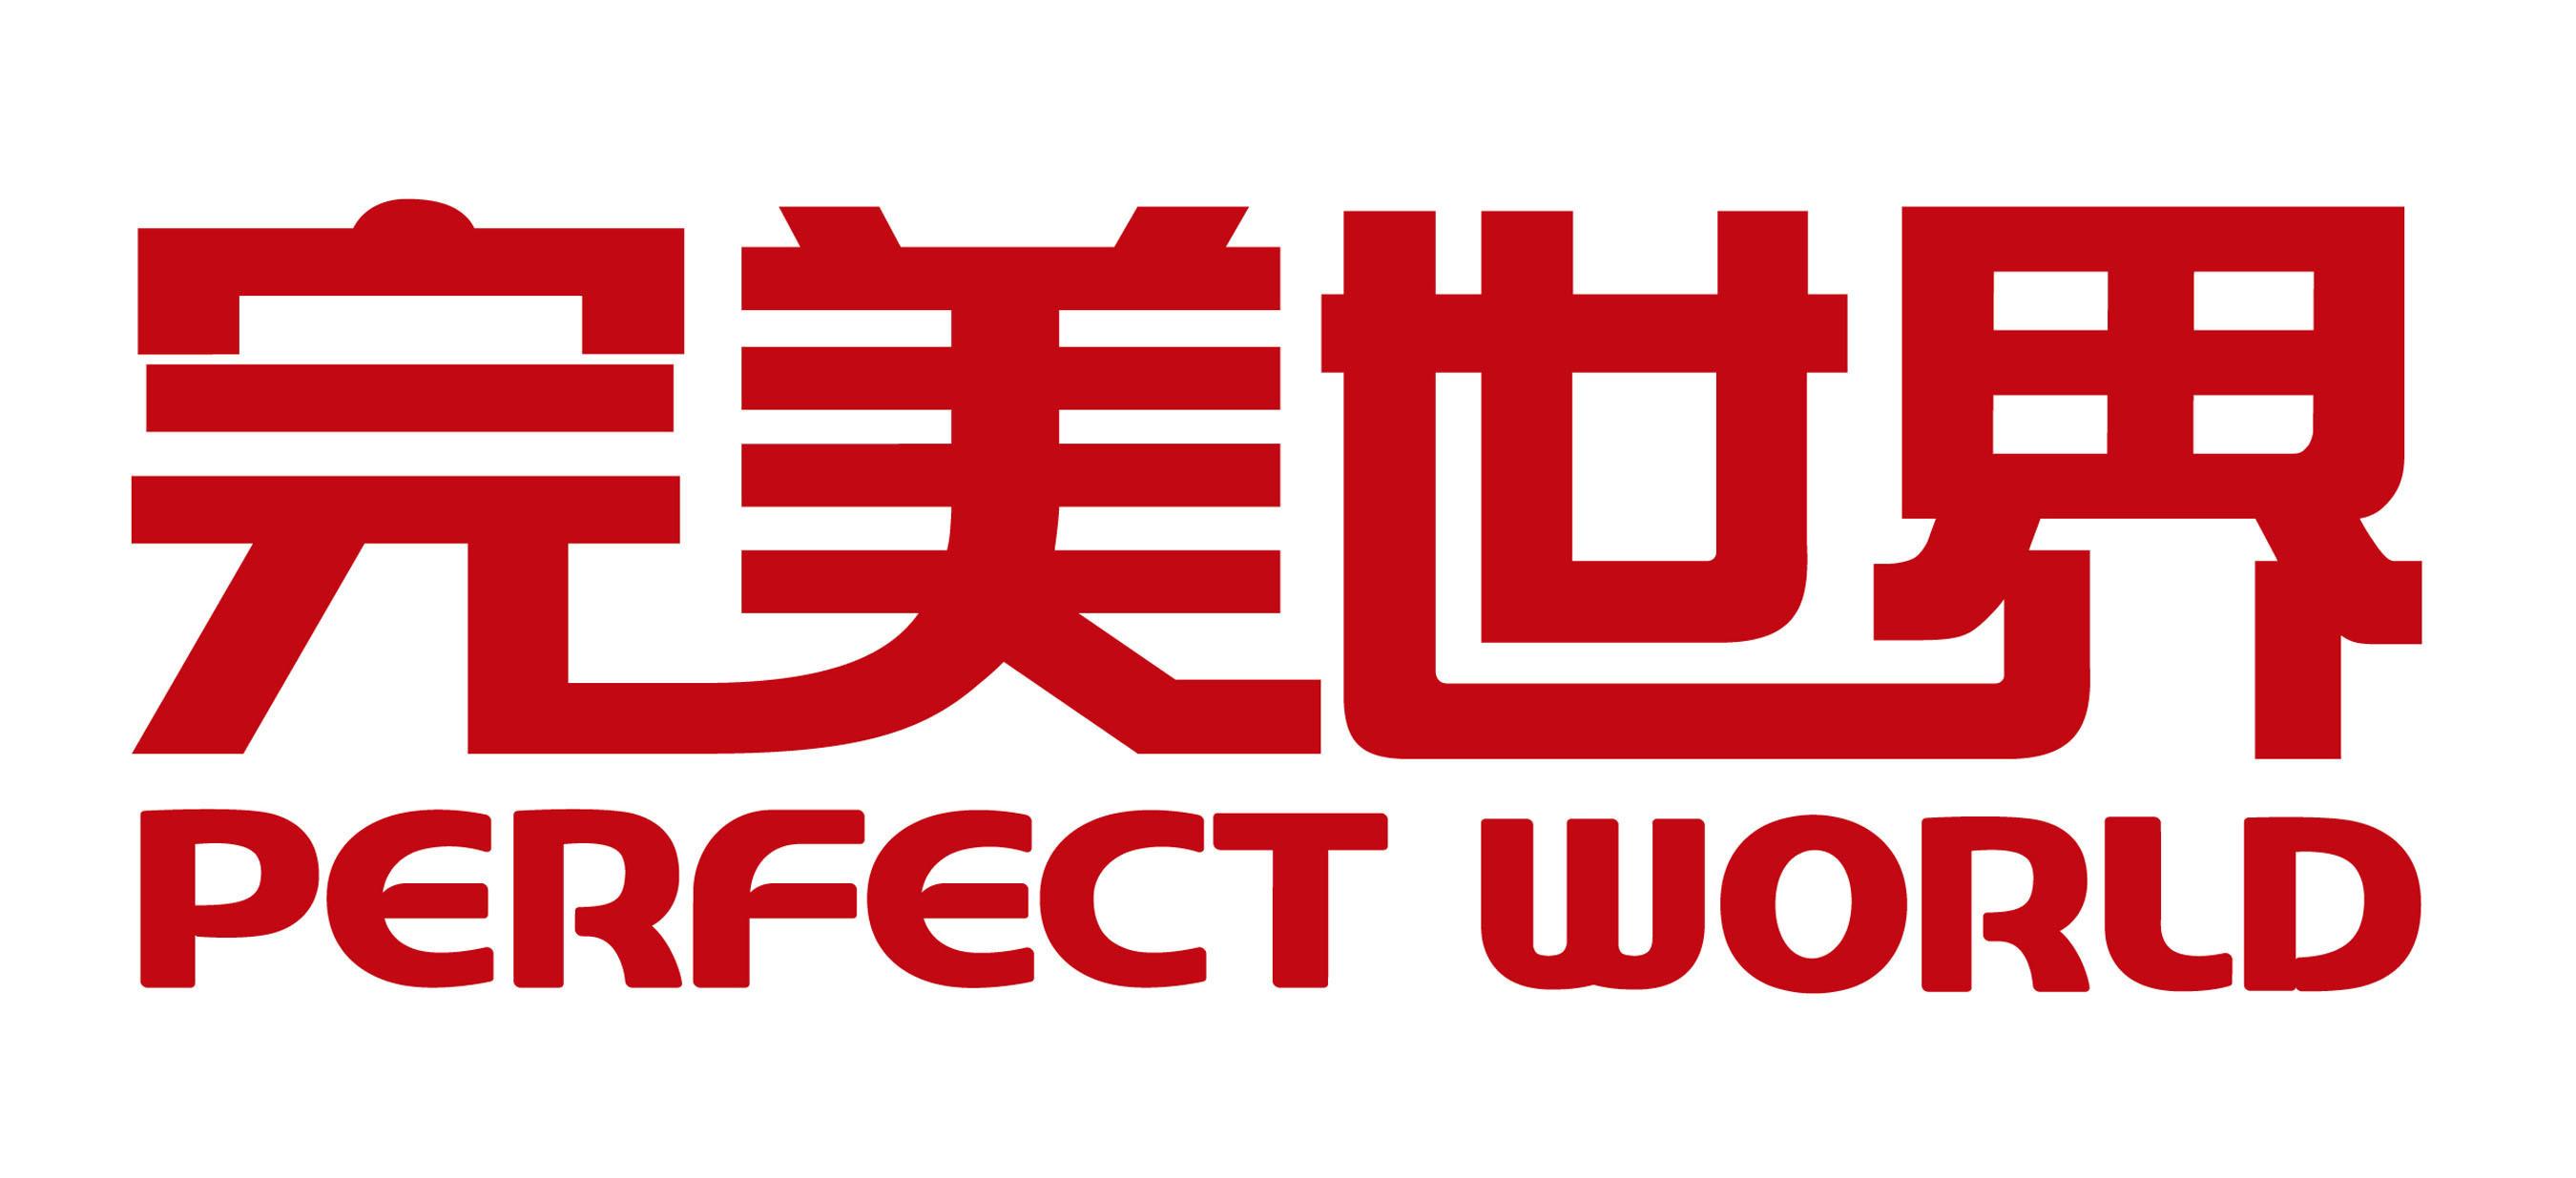 PERFECT WORLD CO., LTD.